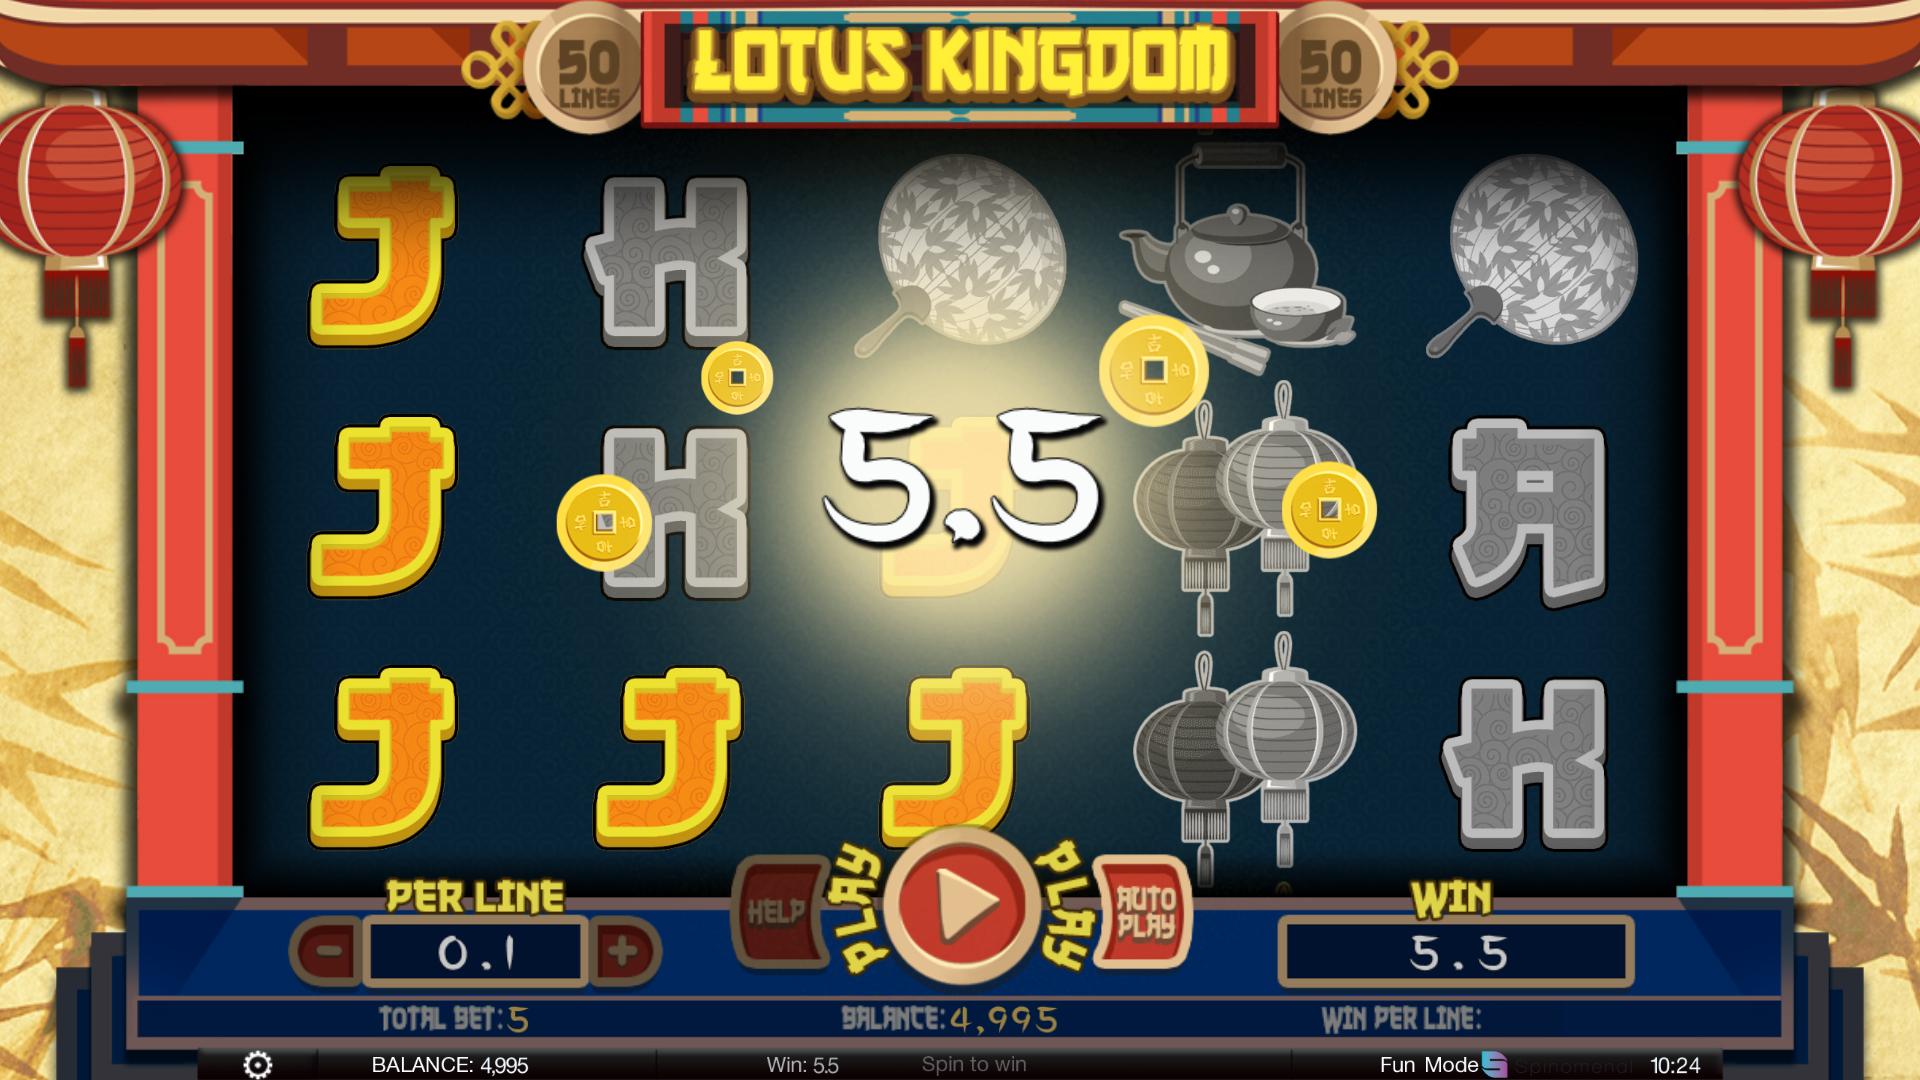 Lotus Kingdom Spinomenal